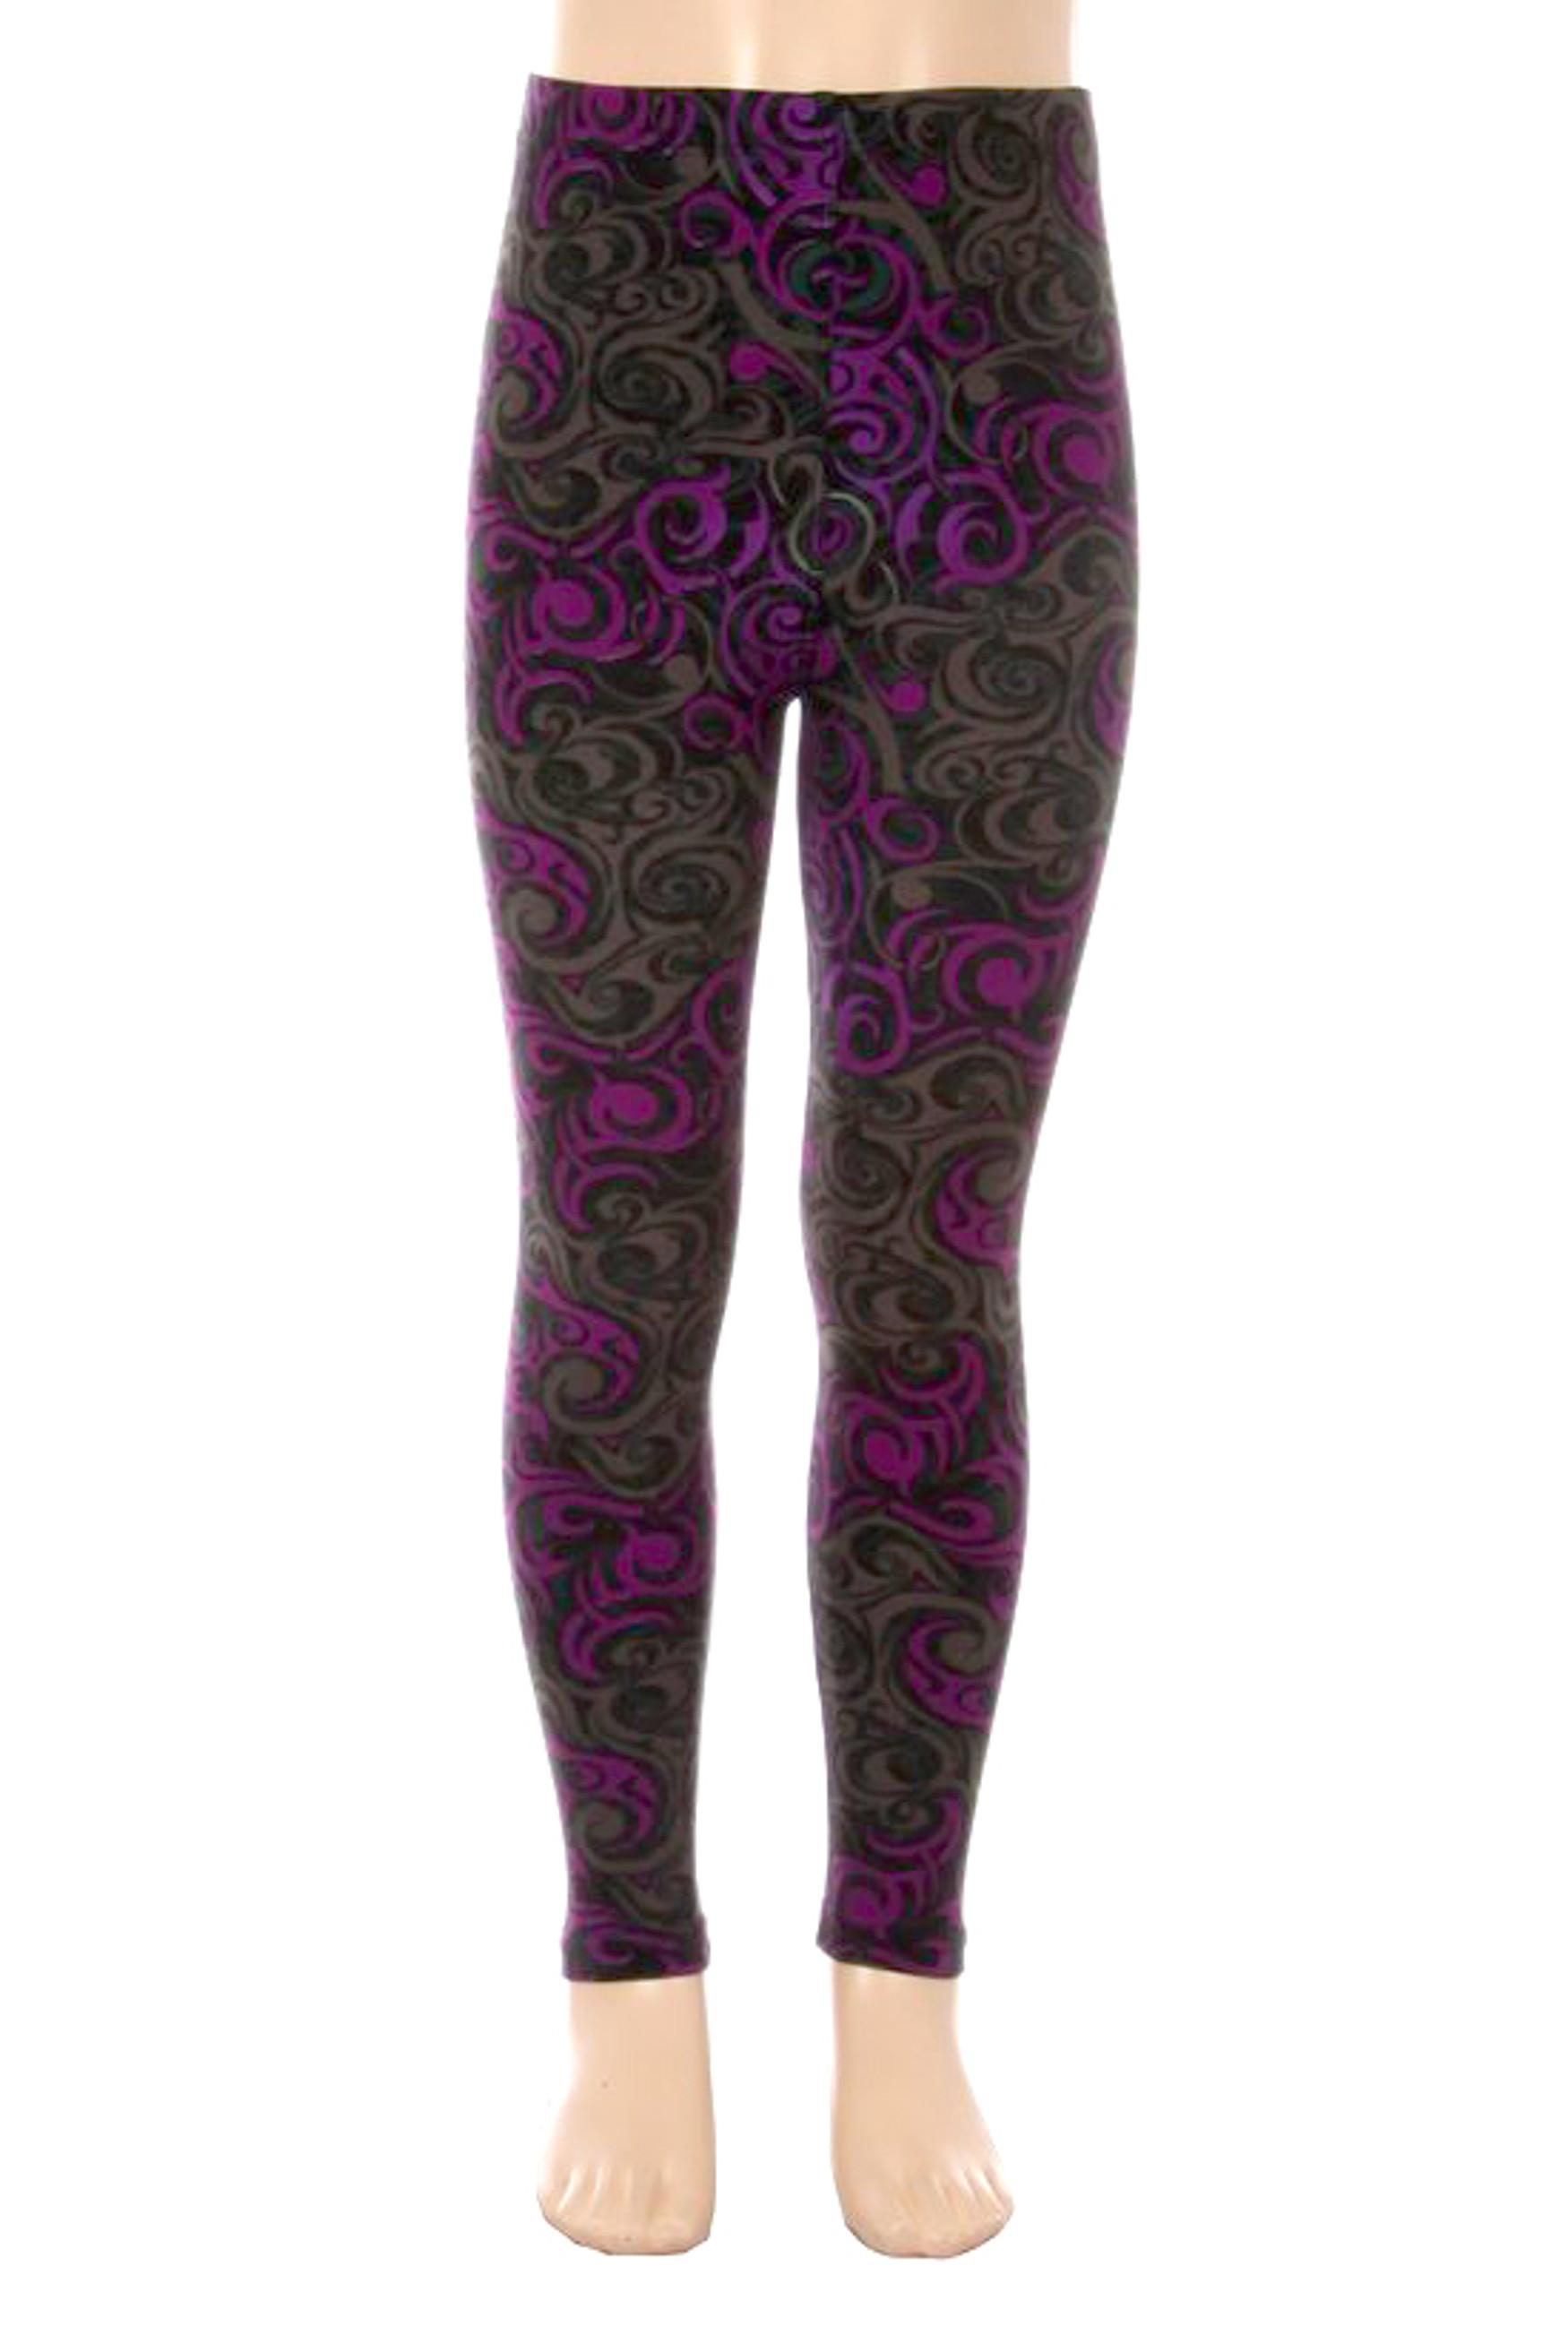 Brushed Purple Tangle Swirl Kids Leggings